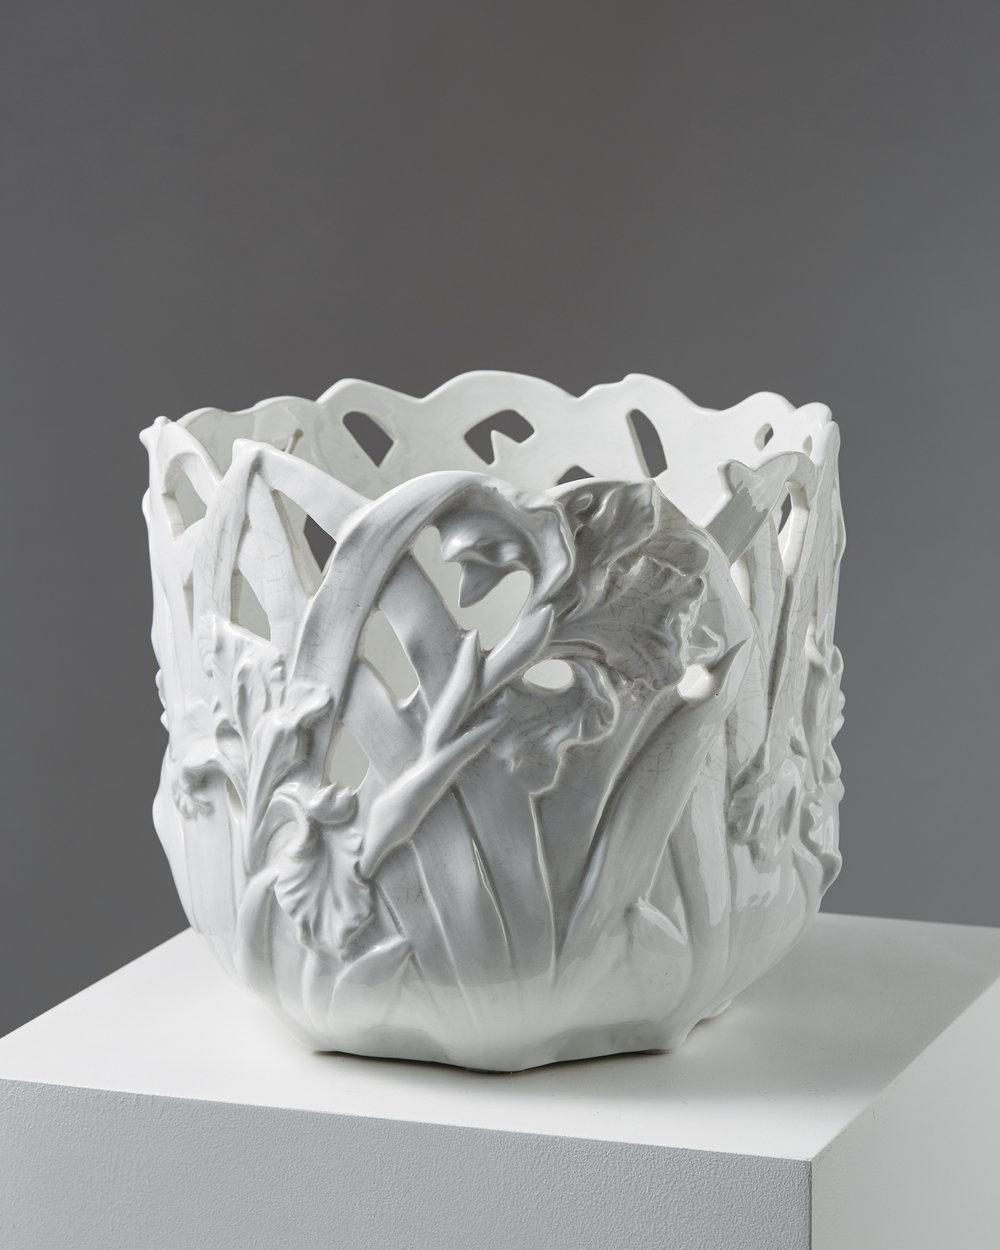 Gunnar Wennerberg  Flower pot Sweden, early 1900's Stoneware. 27 x 30 cm